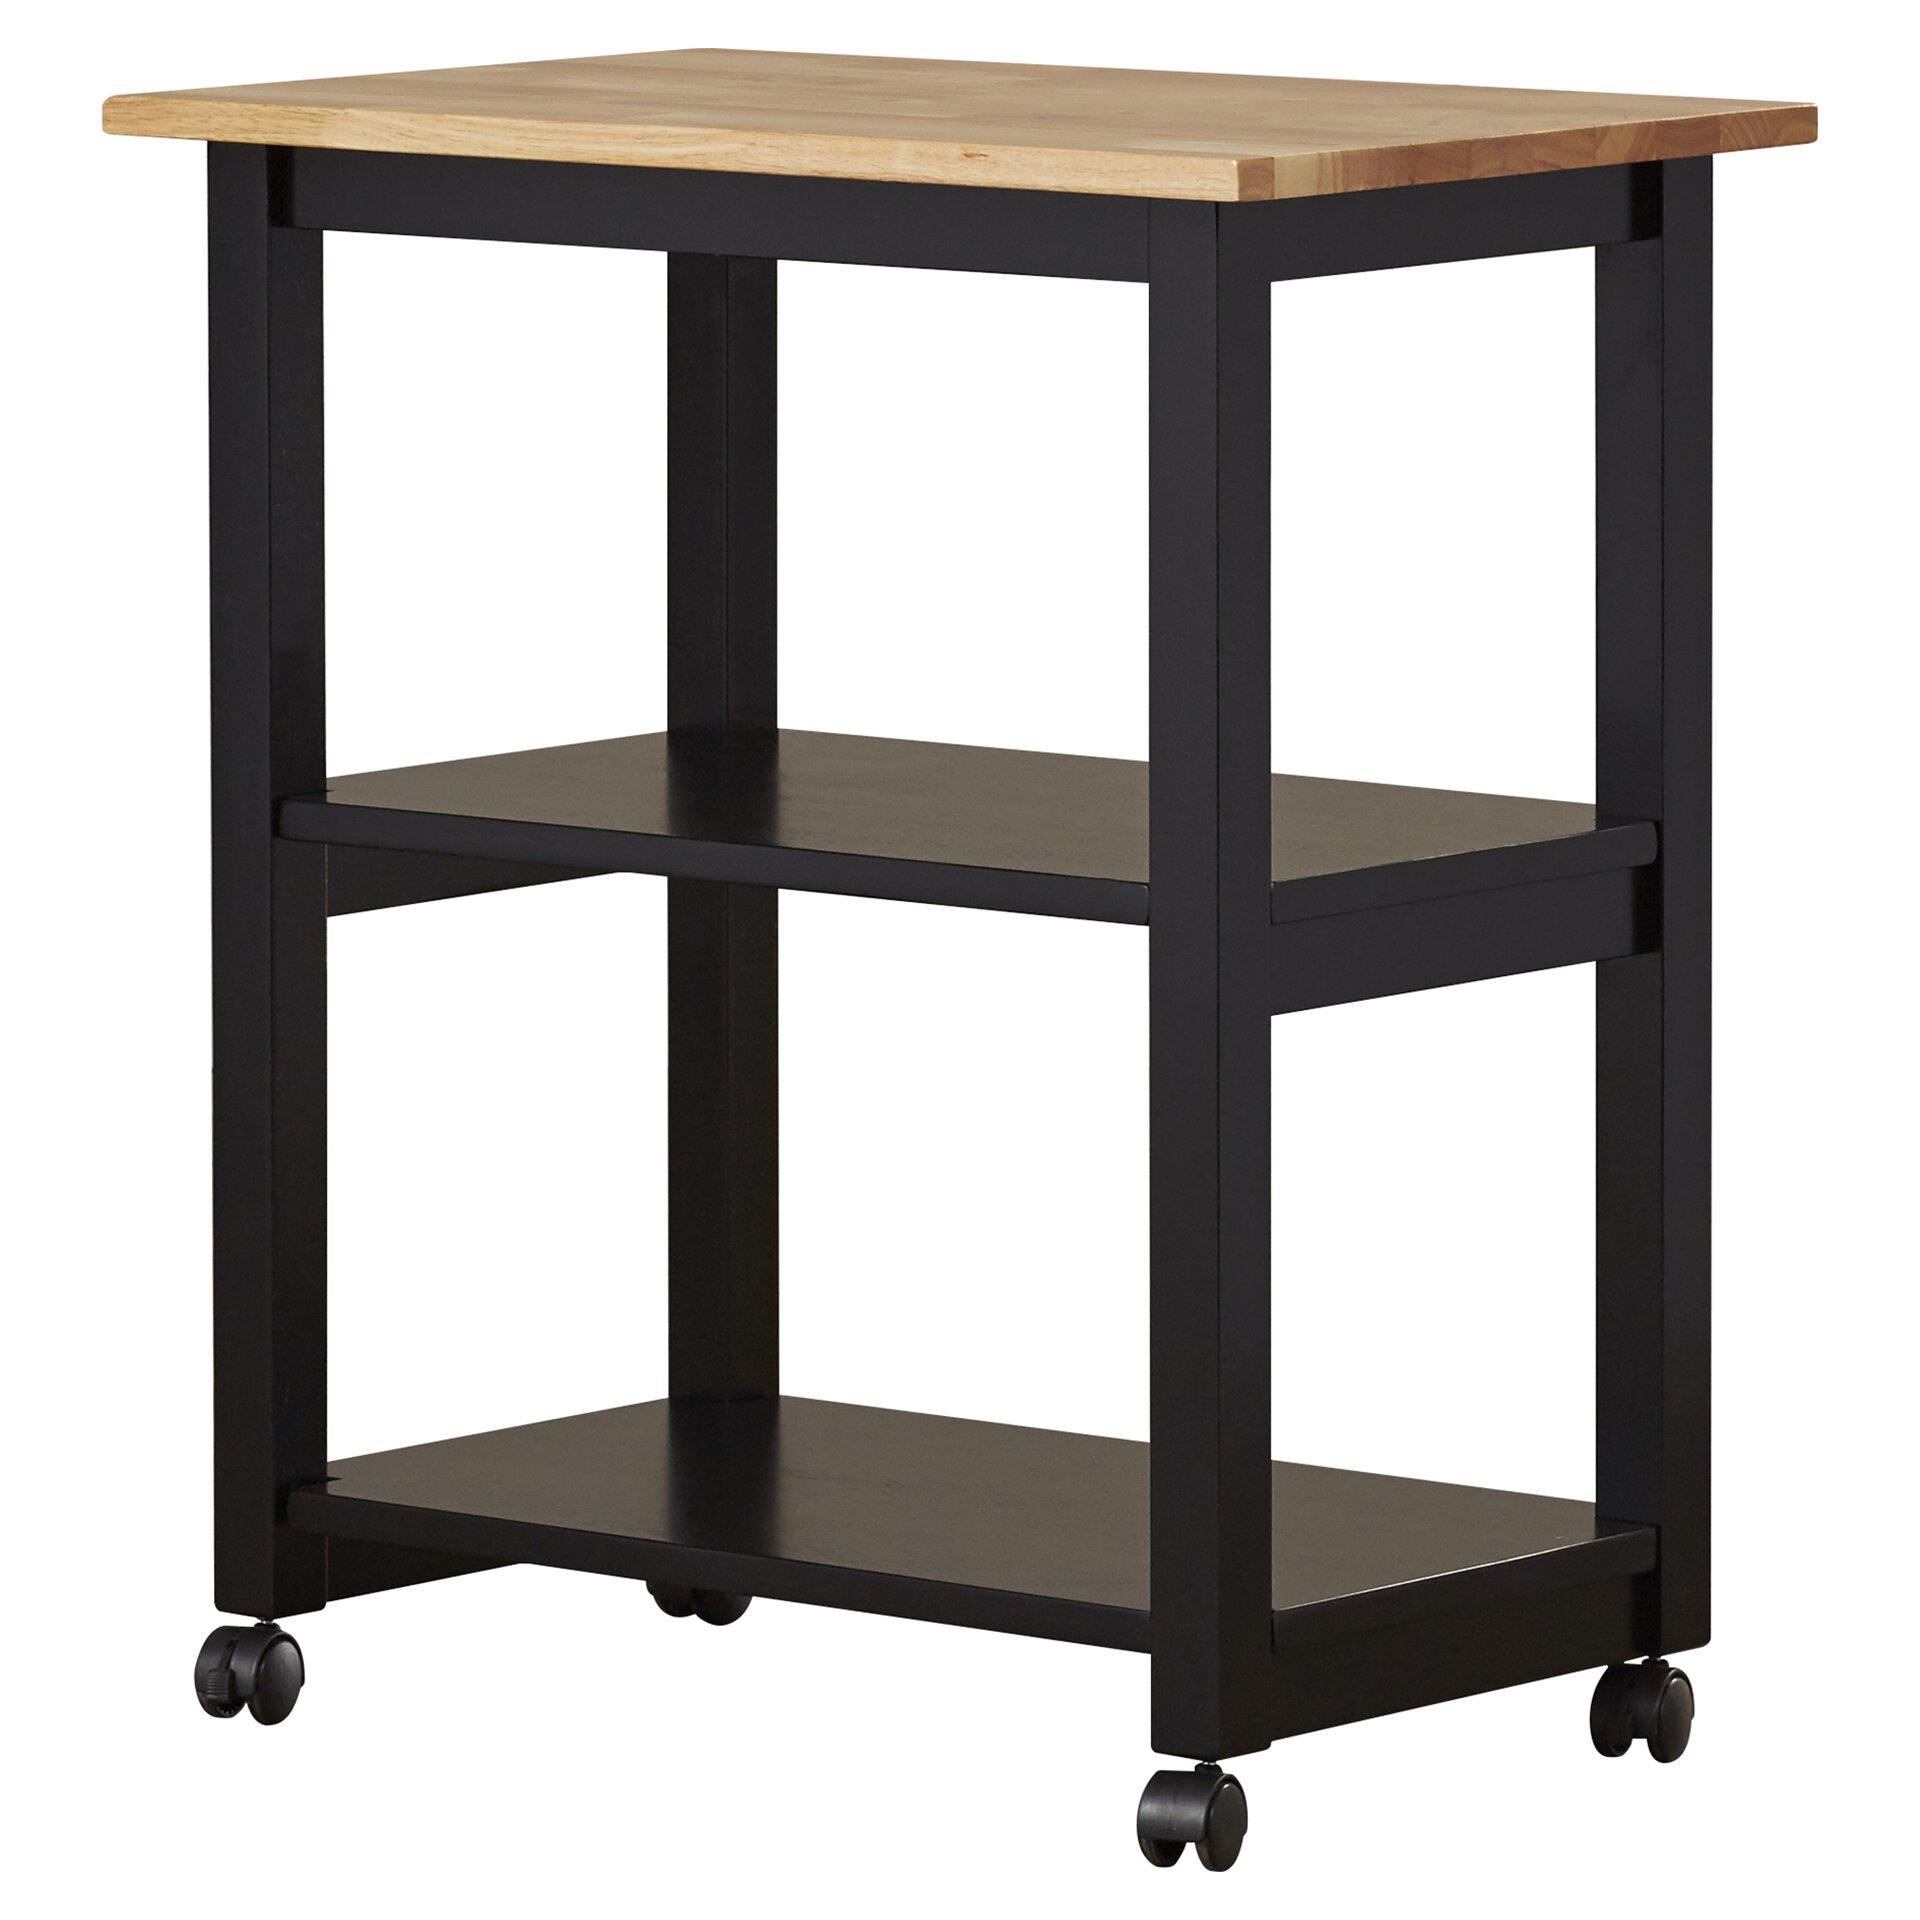 de soto kitchen cart with butcher block top wayfair. Black Bedroom Furniture Sets. Home Design Ideas